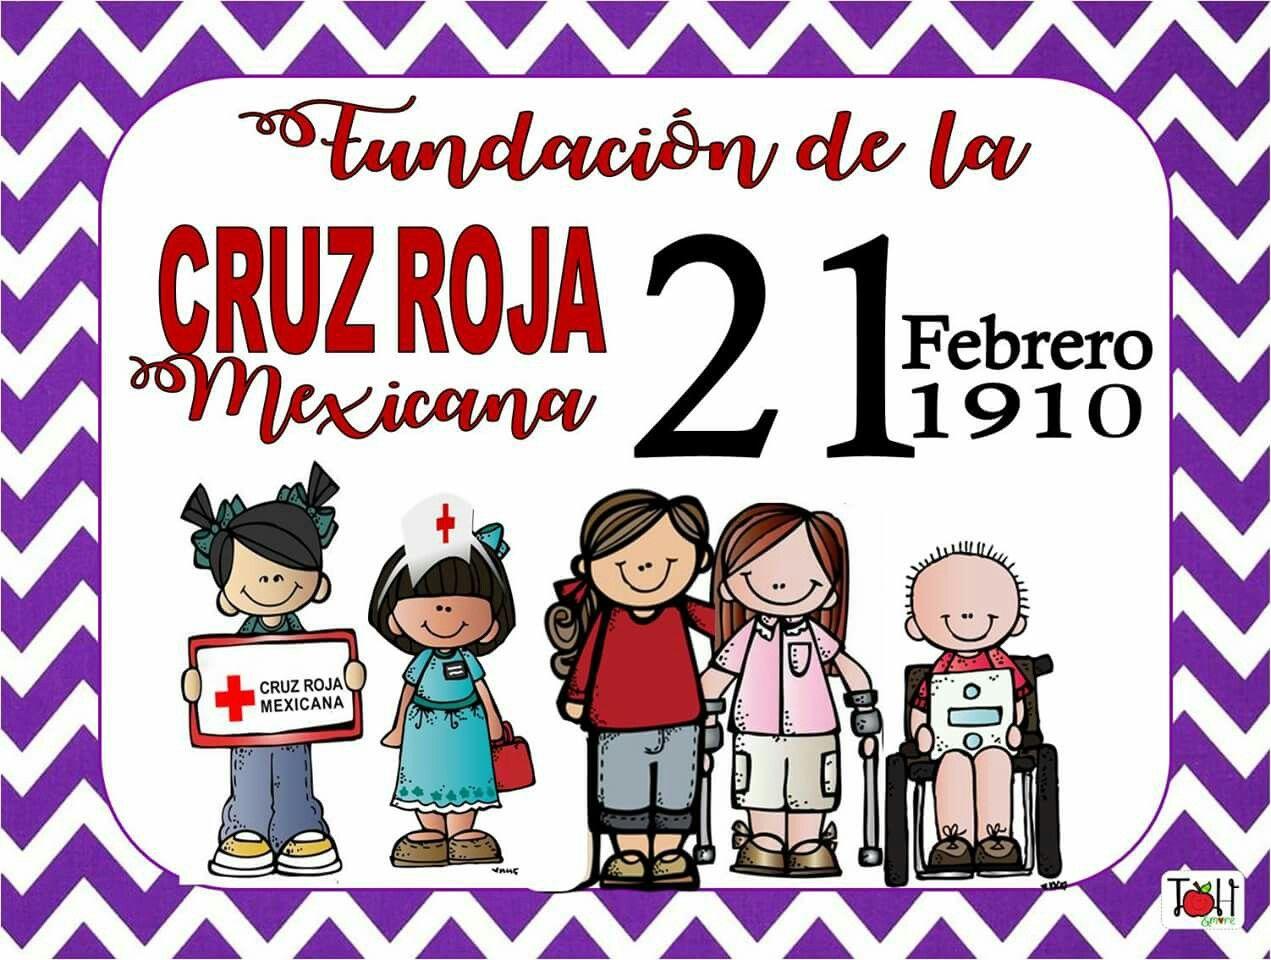 Imagen Sobre Cruz Roja Mexicana De Emangela Garay En Murales